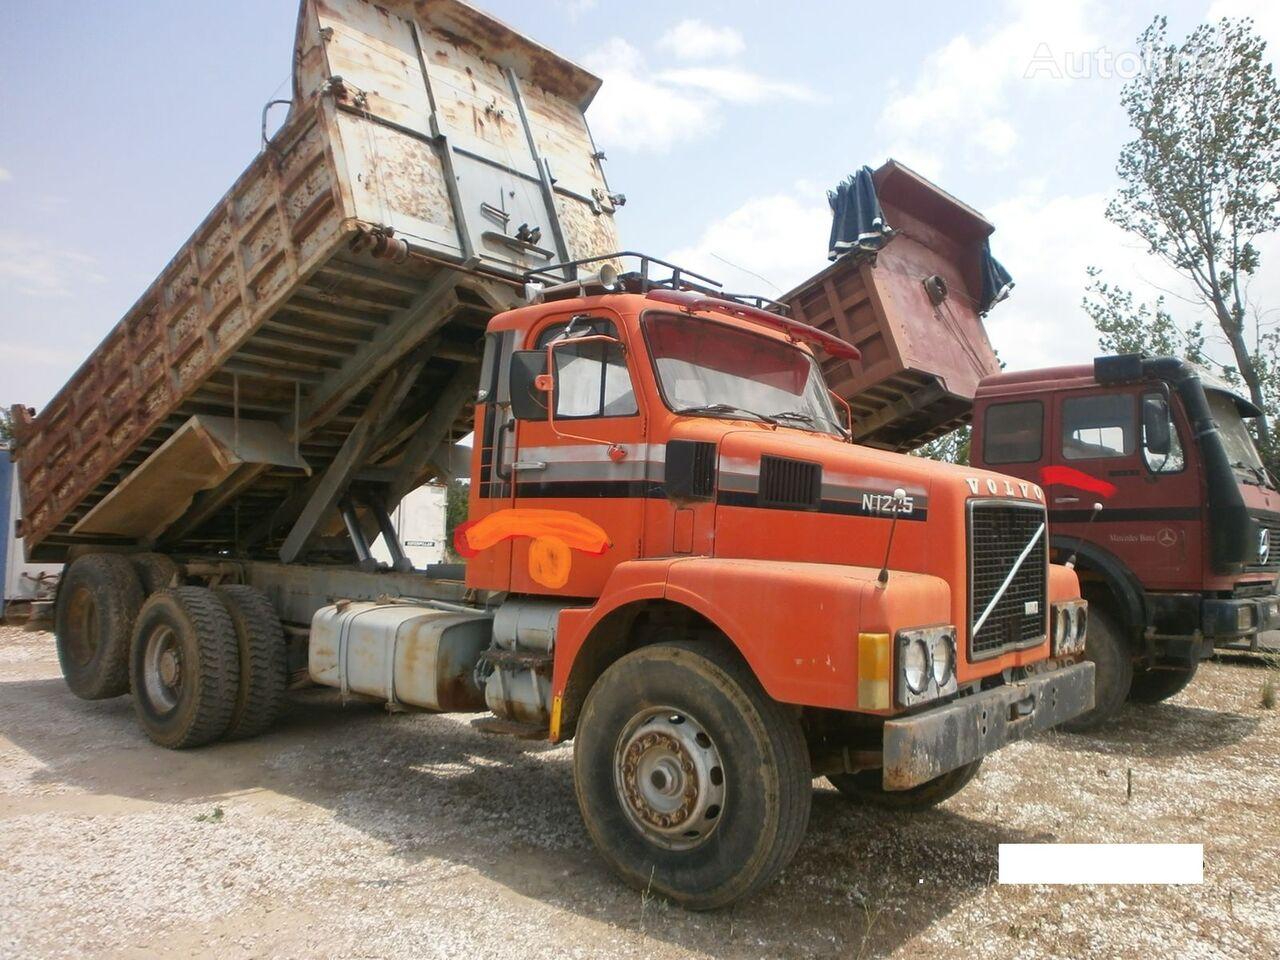 VOLVO N1225 kiper